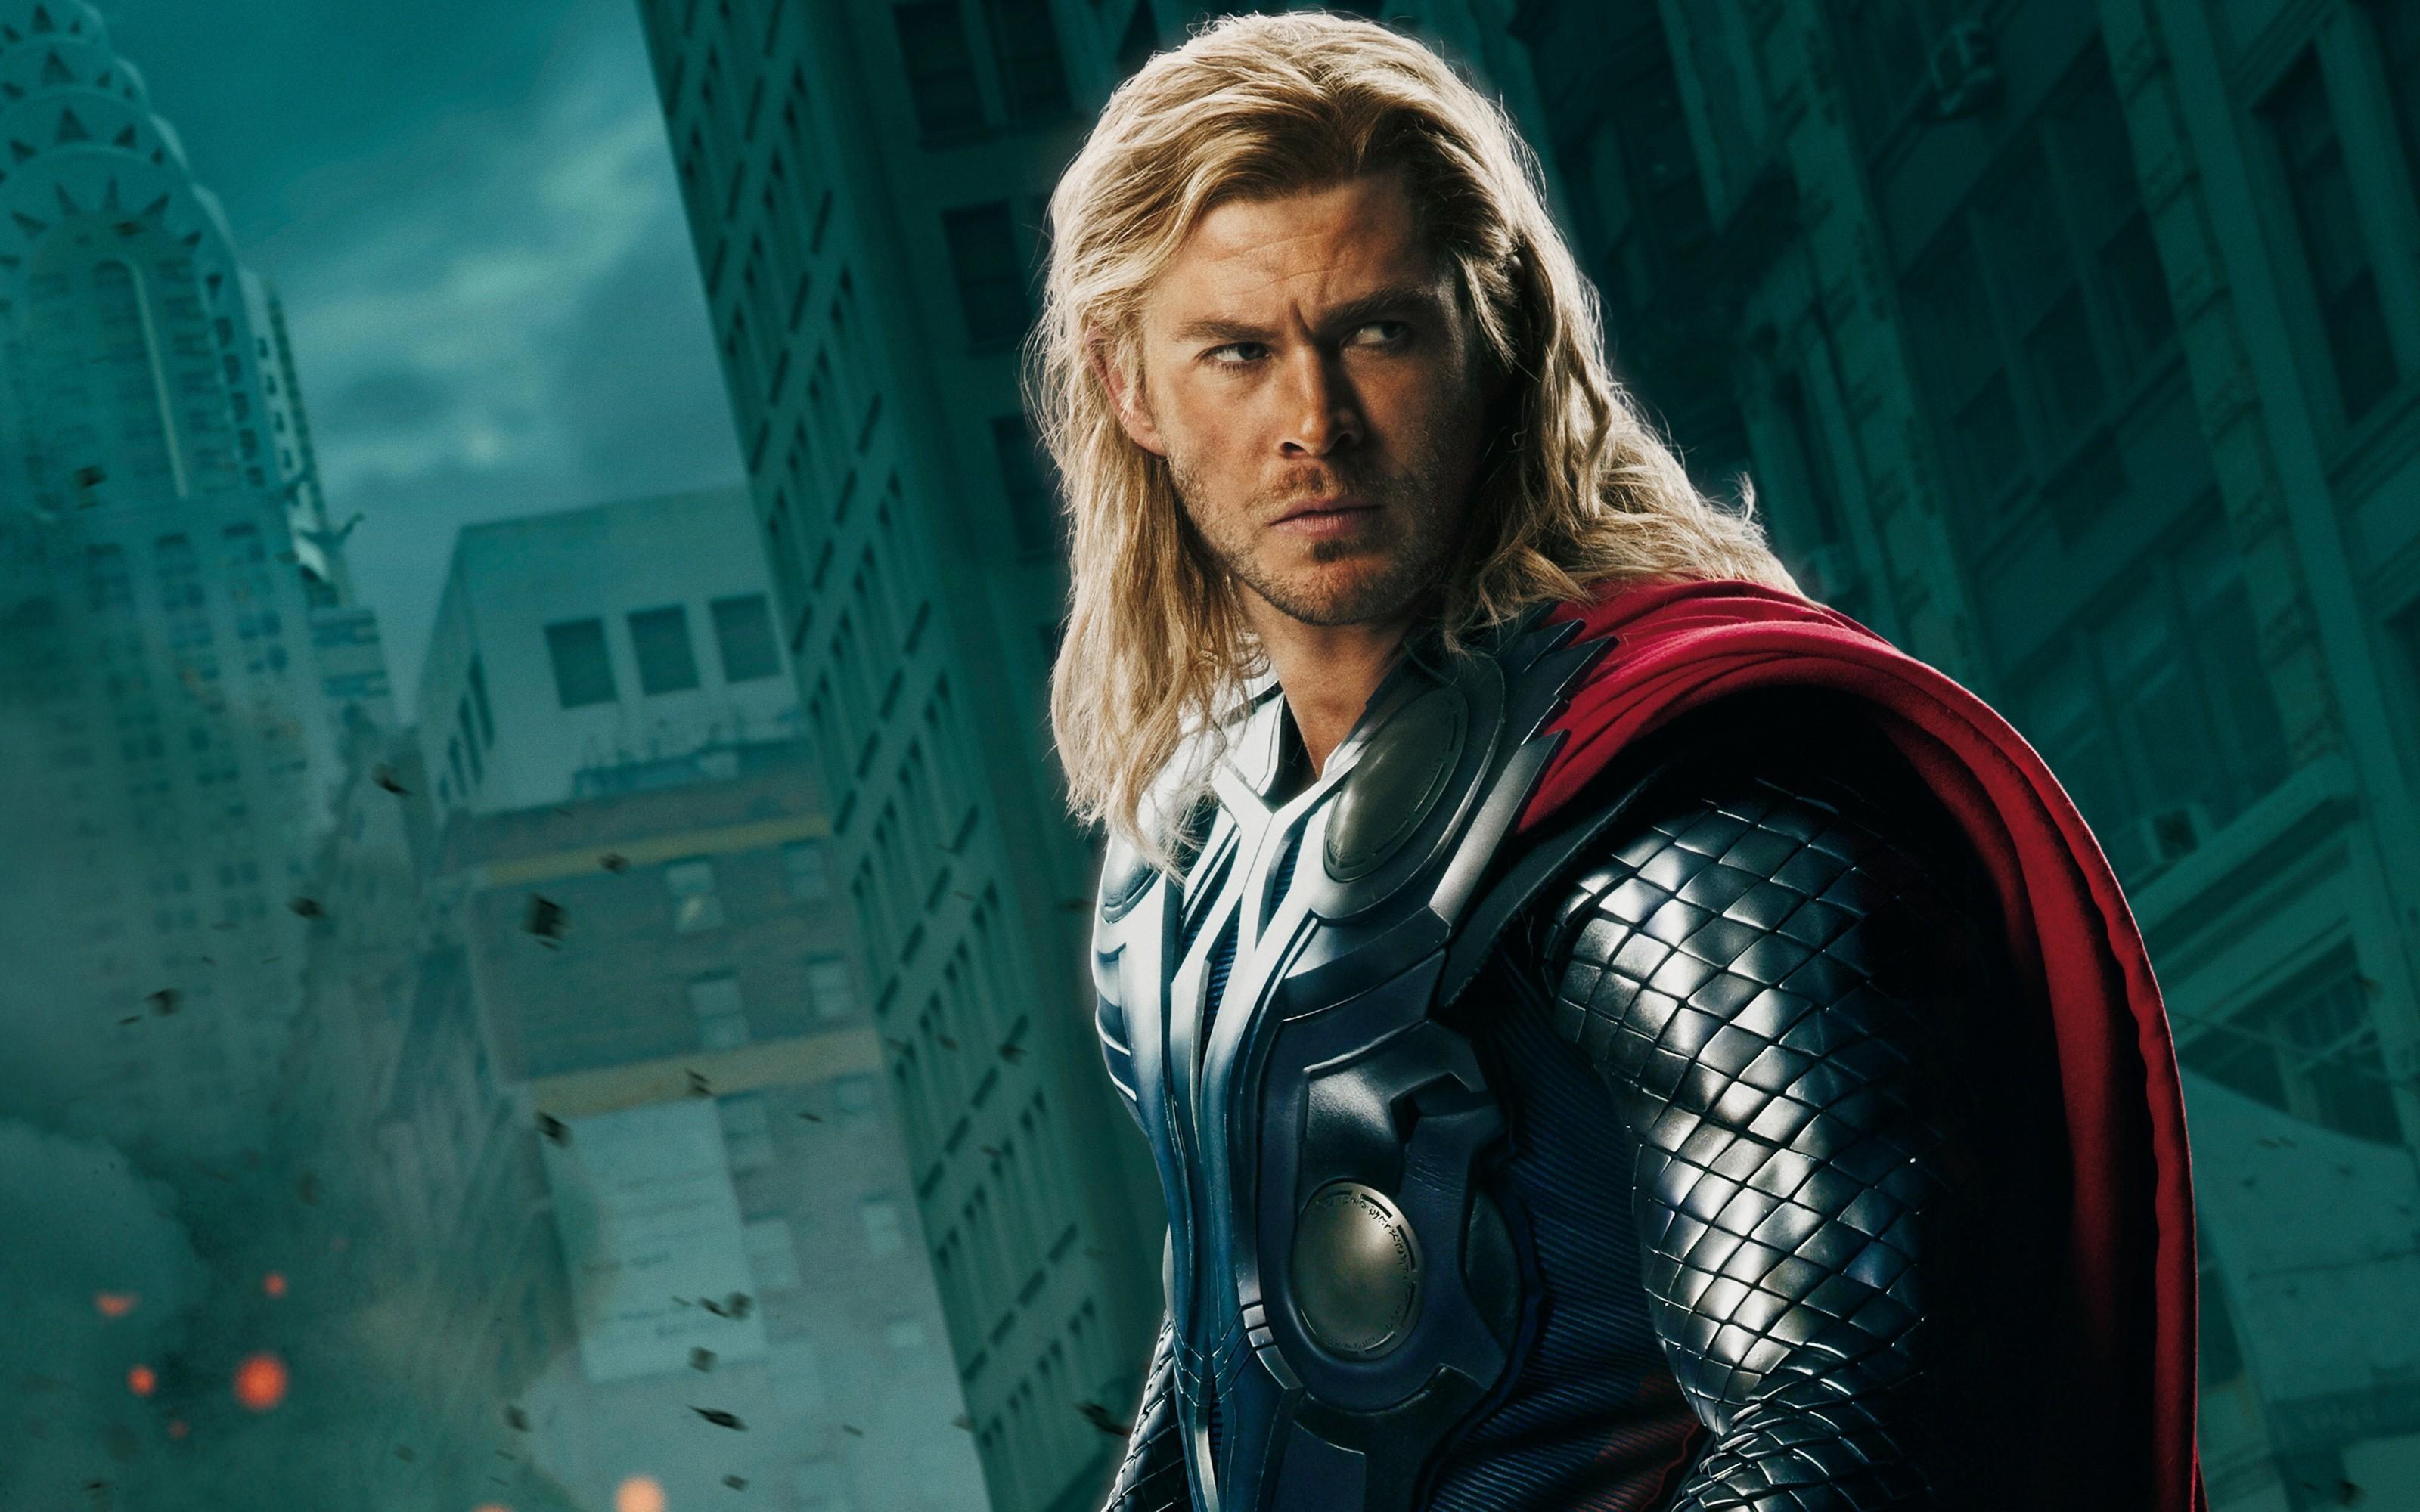 Res: 3200x2000, Chris hemsworth the avengers movie thor wallpaper